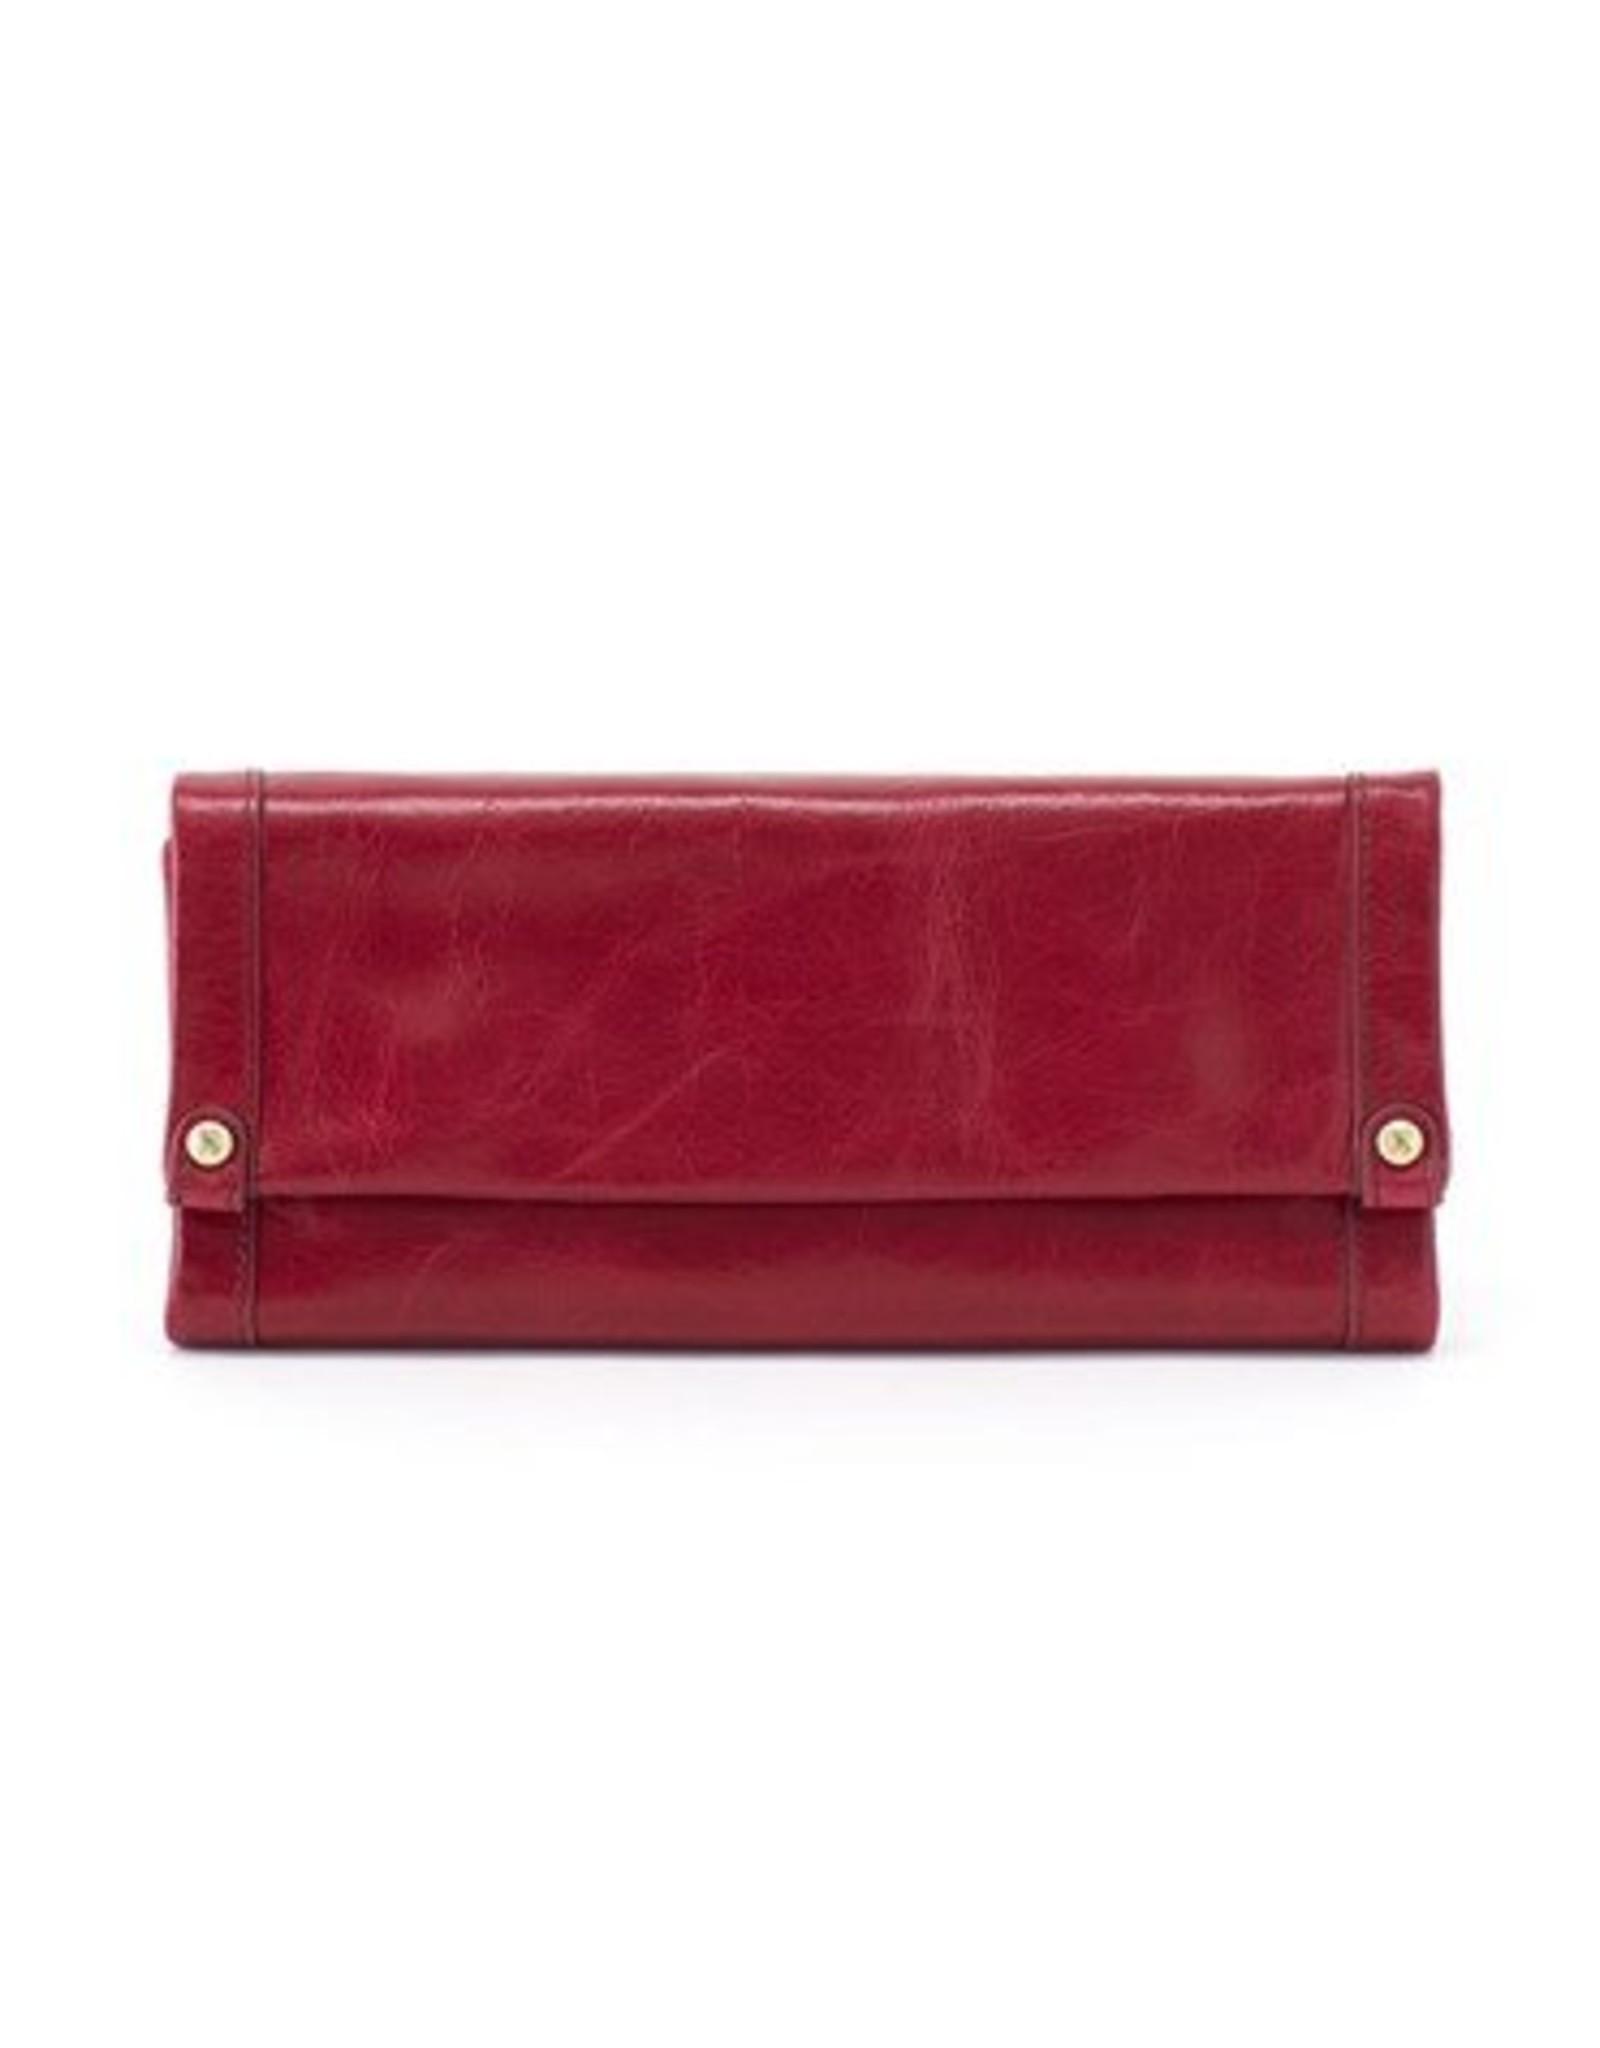 hobo Fable Wallet - Ruby